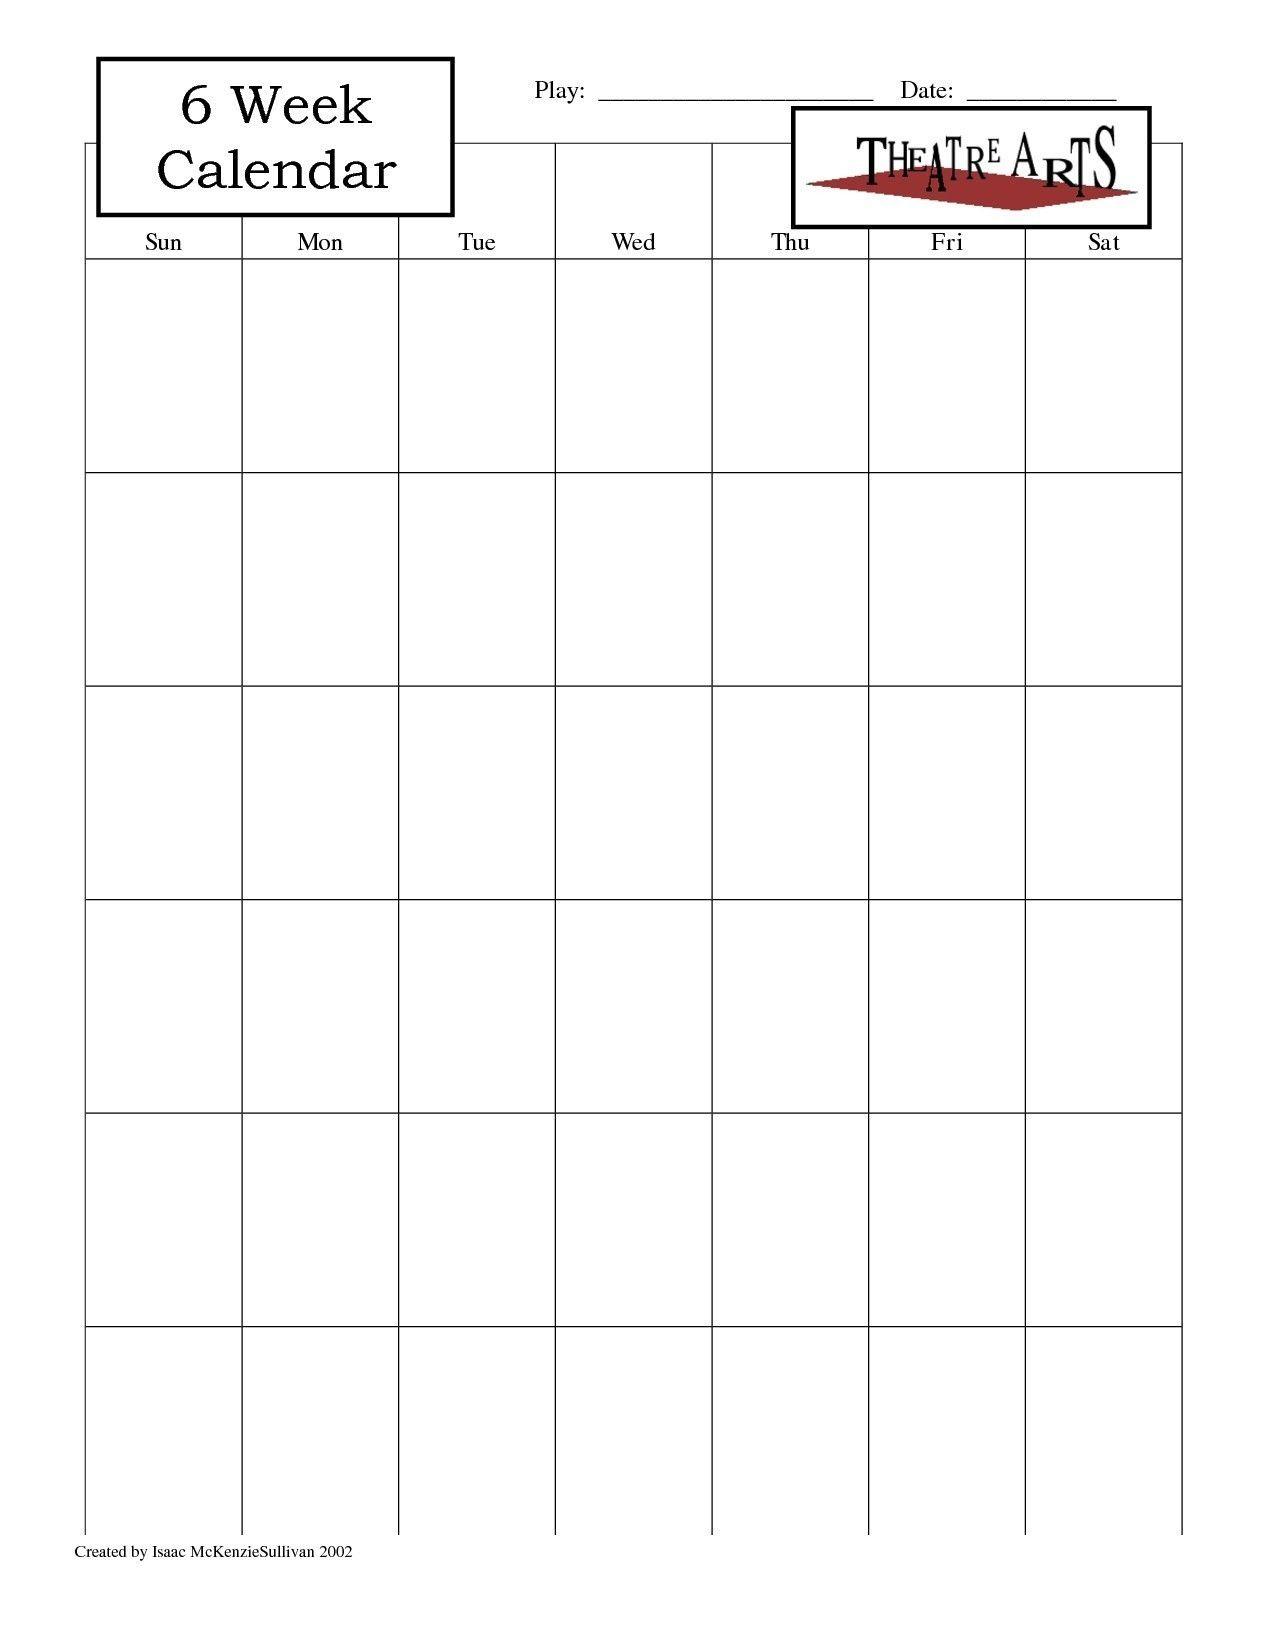 Blank 6 Week Calendar | Thekpark-Hadong Dowload